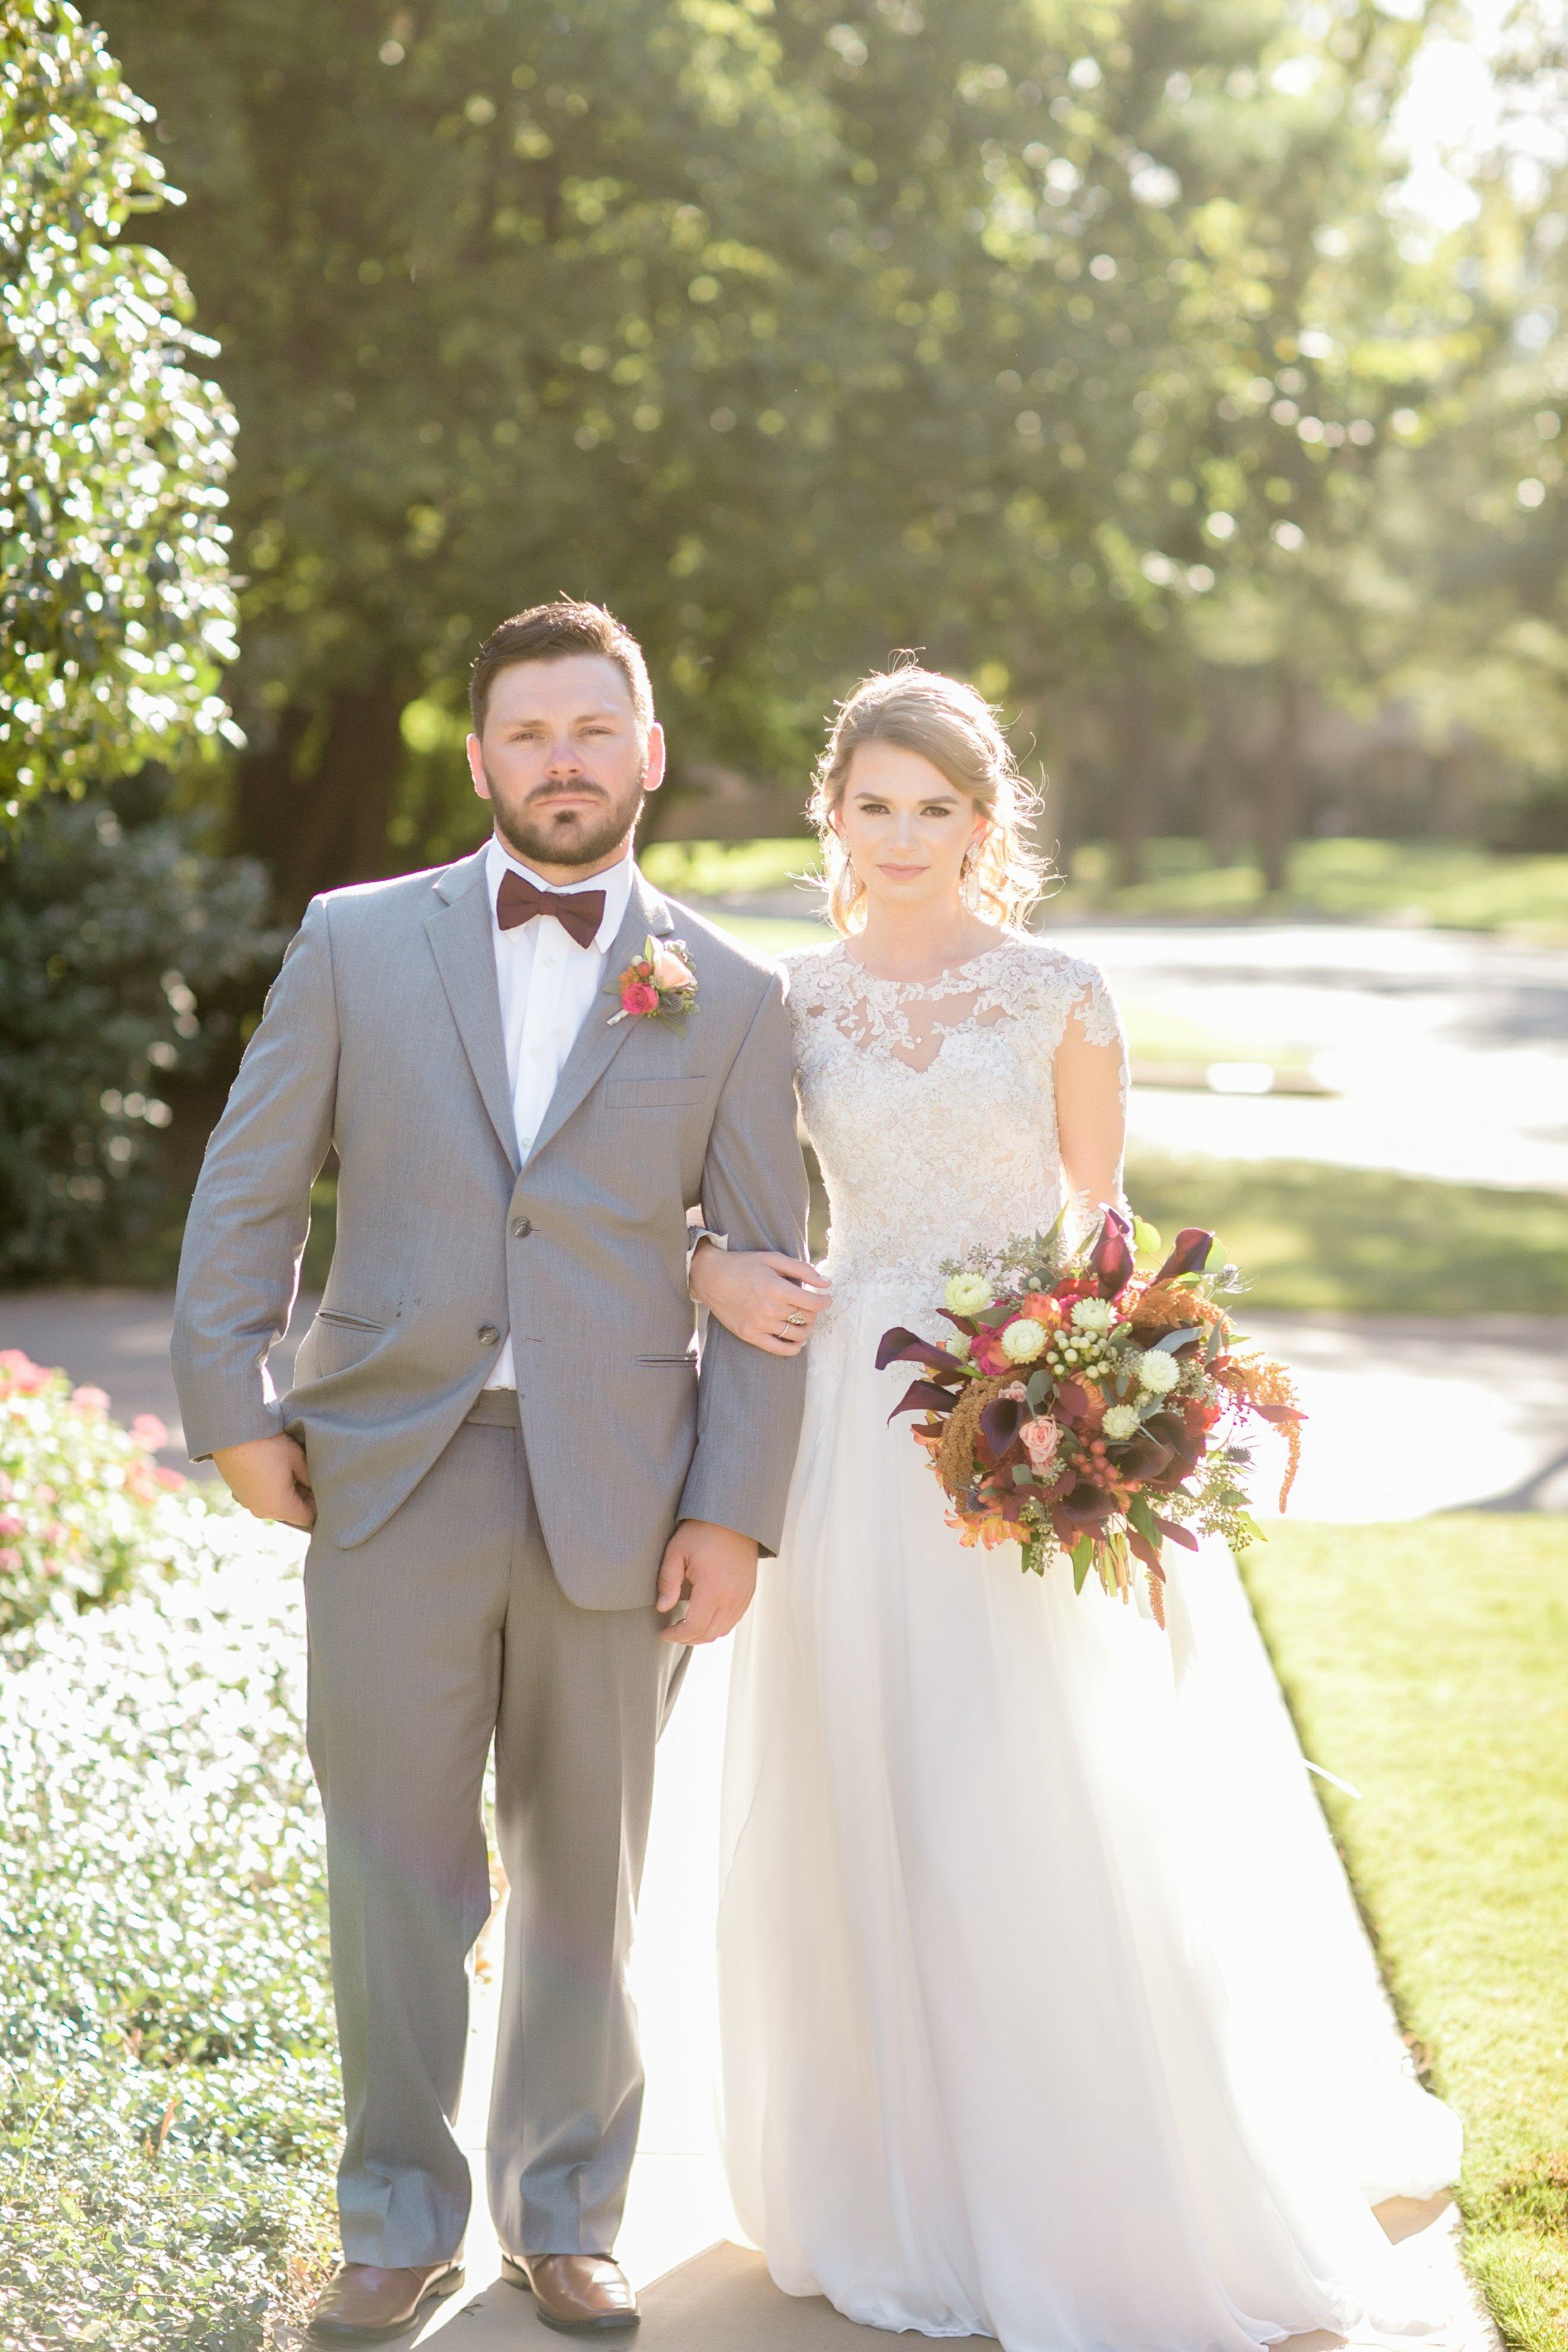 Roberson-Wedding-The-Forum-Lauren-Pinson-Wedding-Photography-Wichita-Falls-Texas-037.jpg